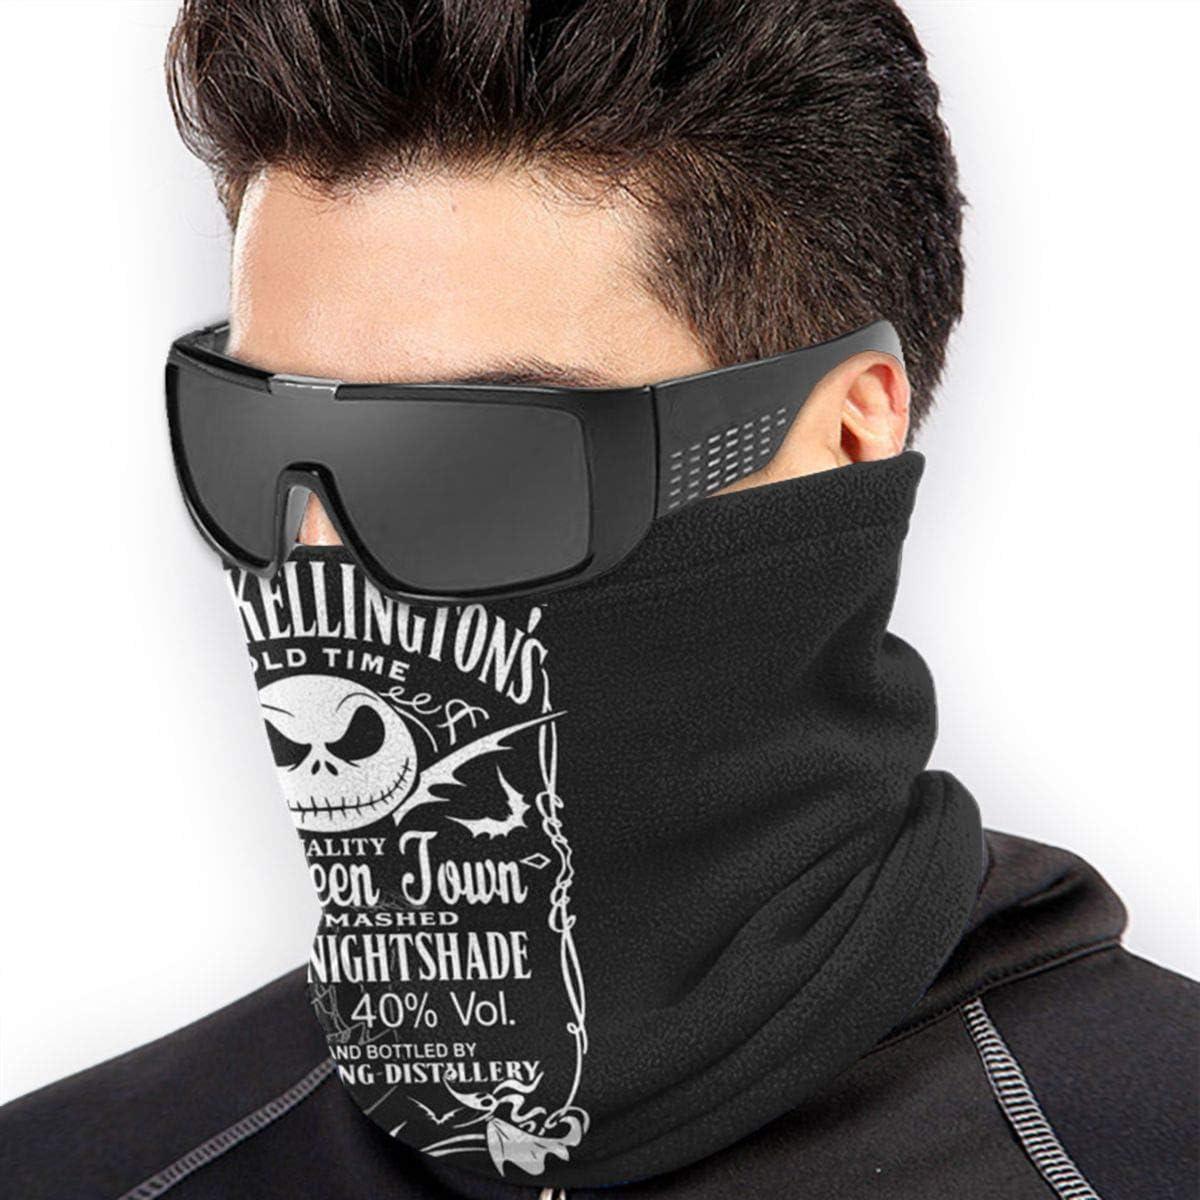 Jack Skellington Daniels Dust Wind UV Fleece Neck Warmer Gaiter Seamless Face Mask Outdoor Cold Weather Winter Neck Gaiter Windproof Breathable Bandana Balaclavas For Men Women